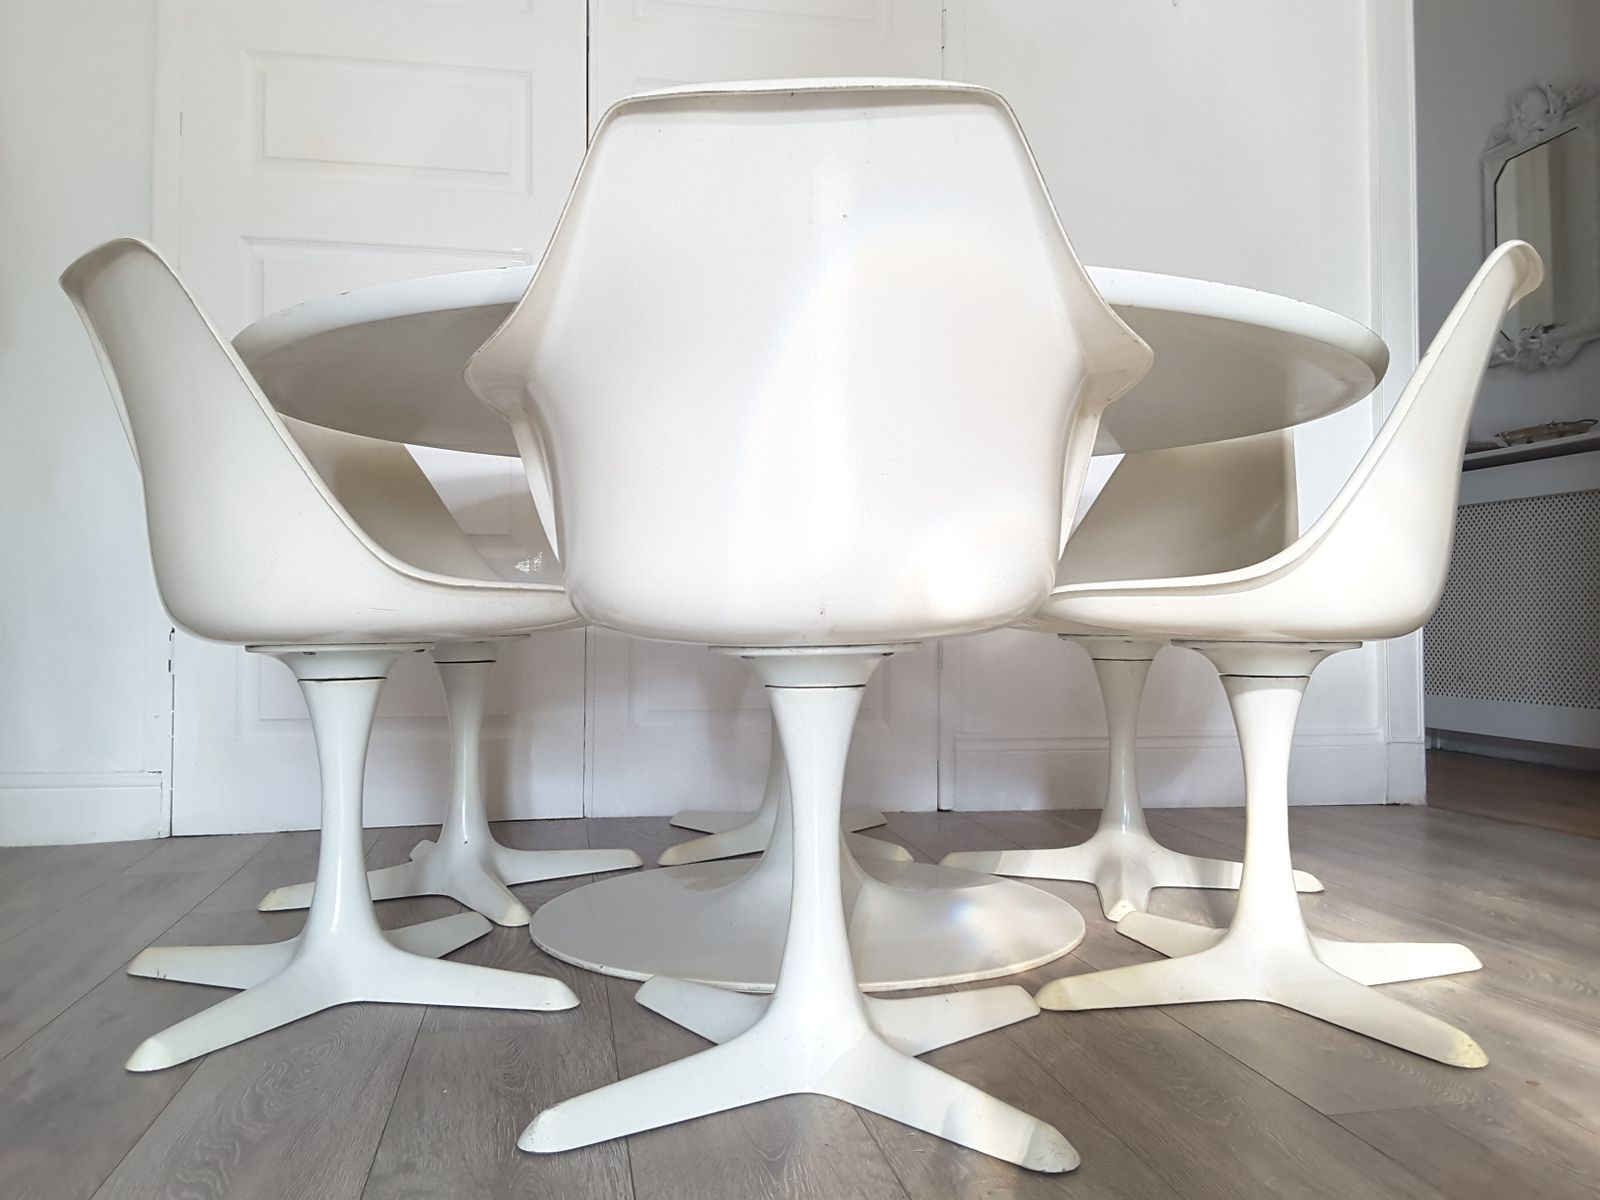 Grande table de salle manger ronde tulip et six chaises par maurice burke pour arkana 1970s for Grande table salle a manger 2